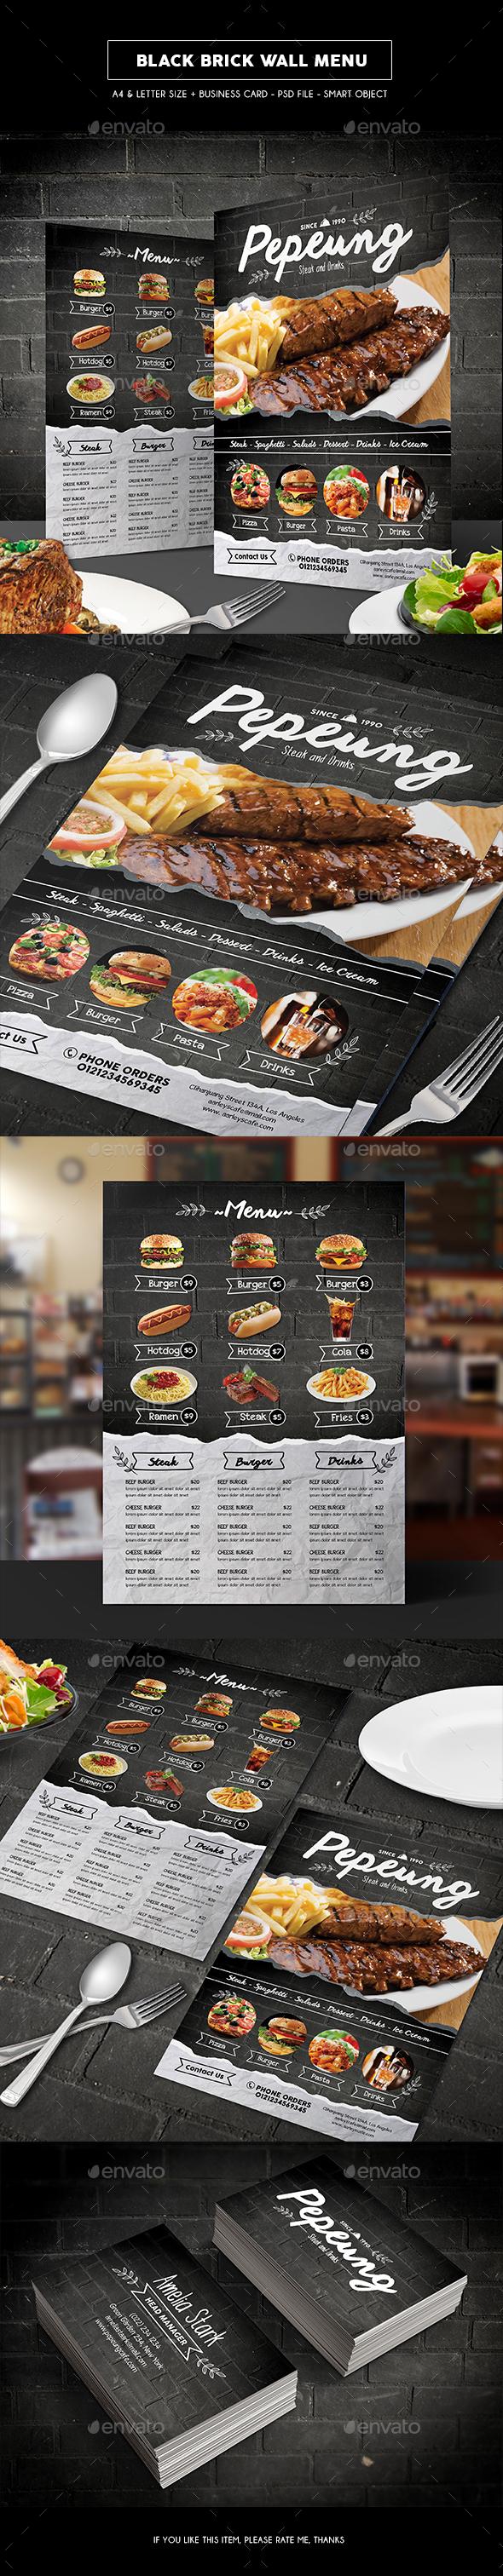 Black Brick Wall Menu - Food Menus Print Templates